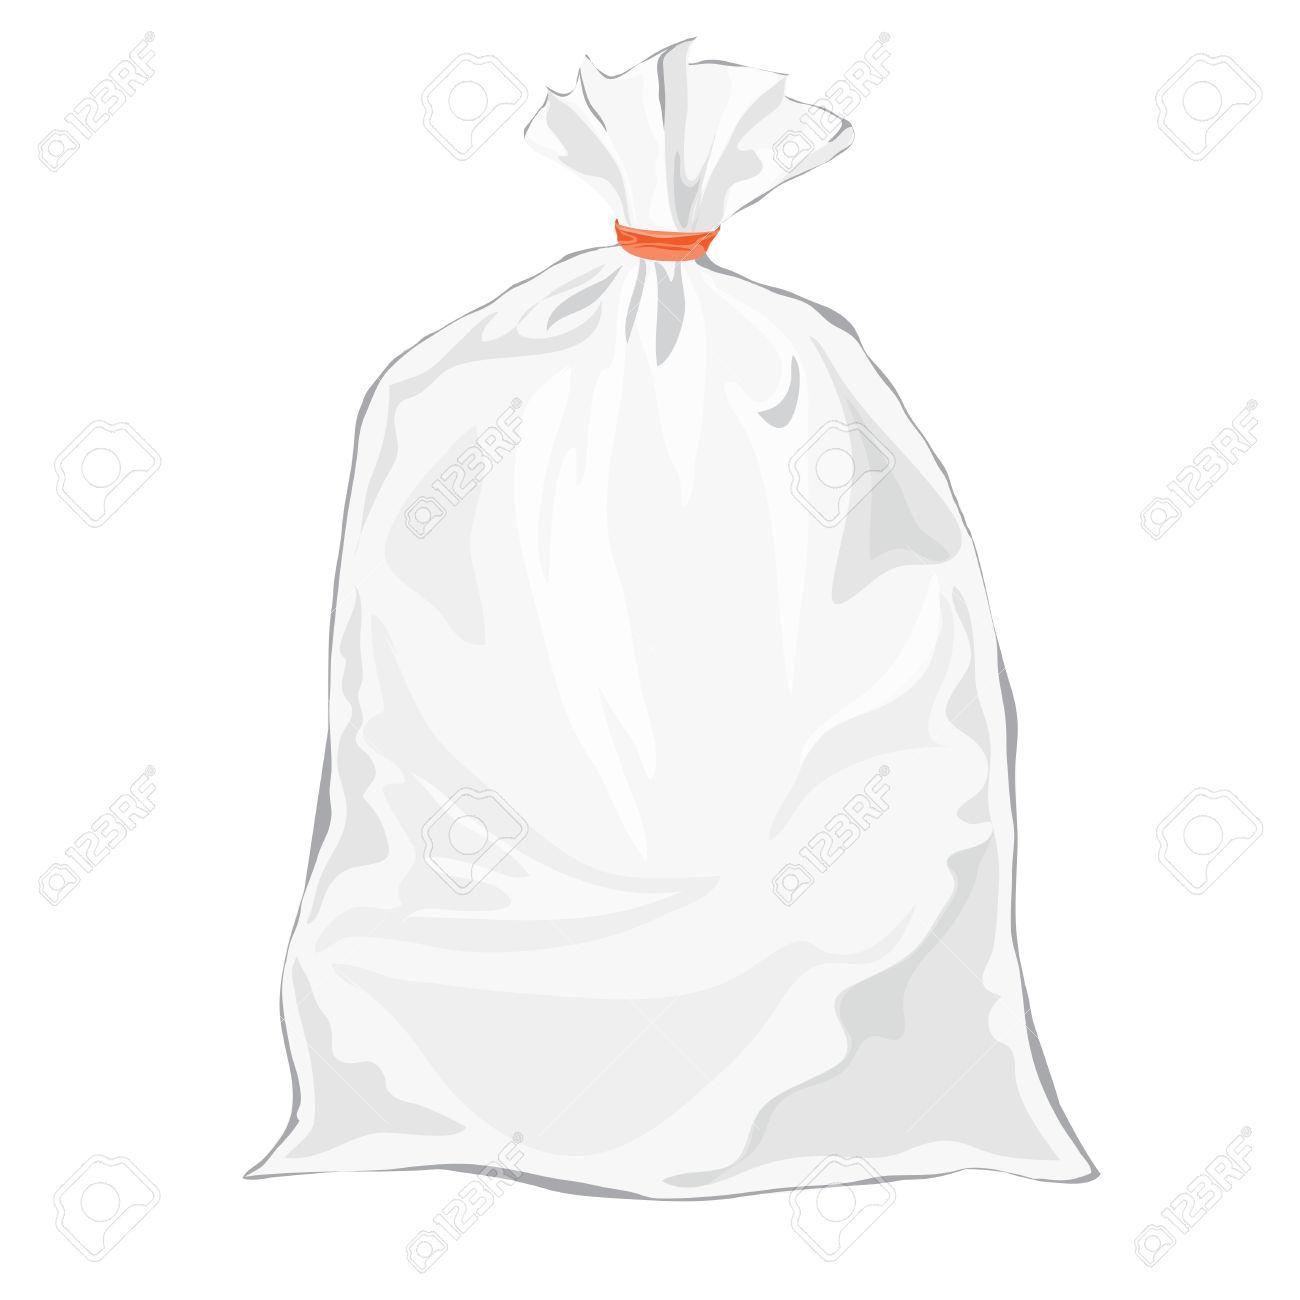 Clear plastic bag clipart.